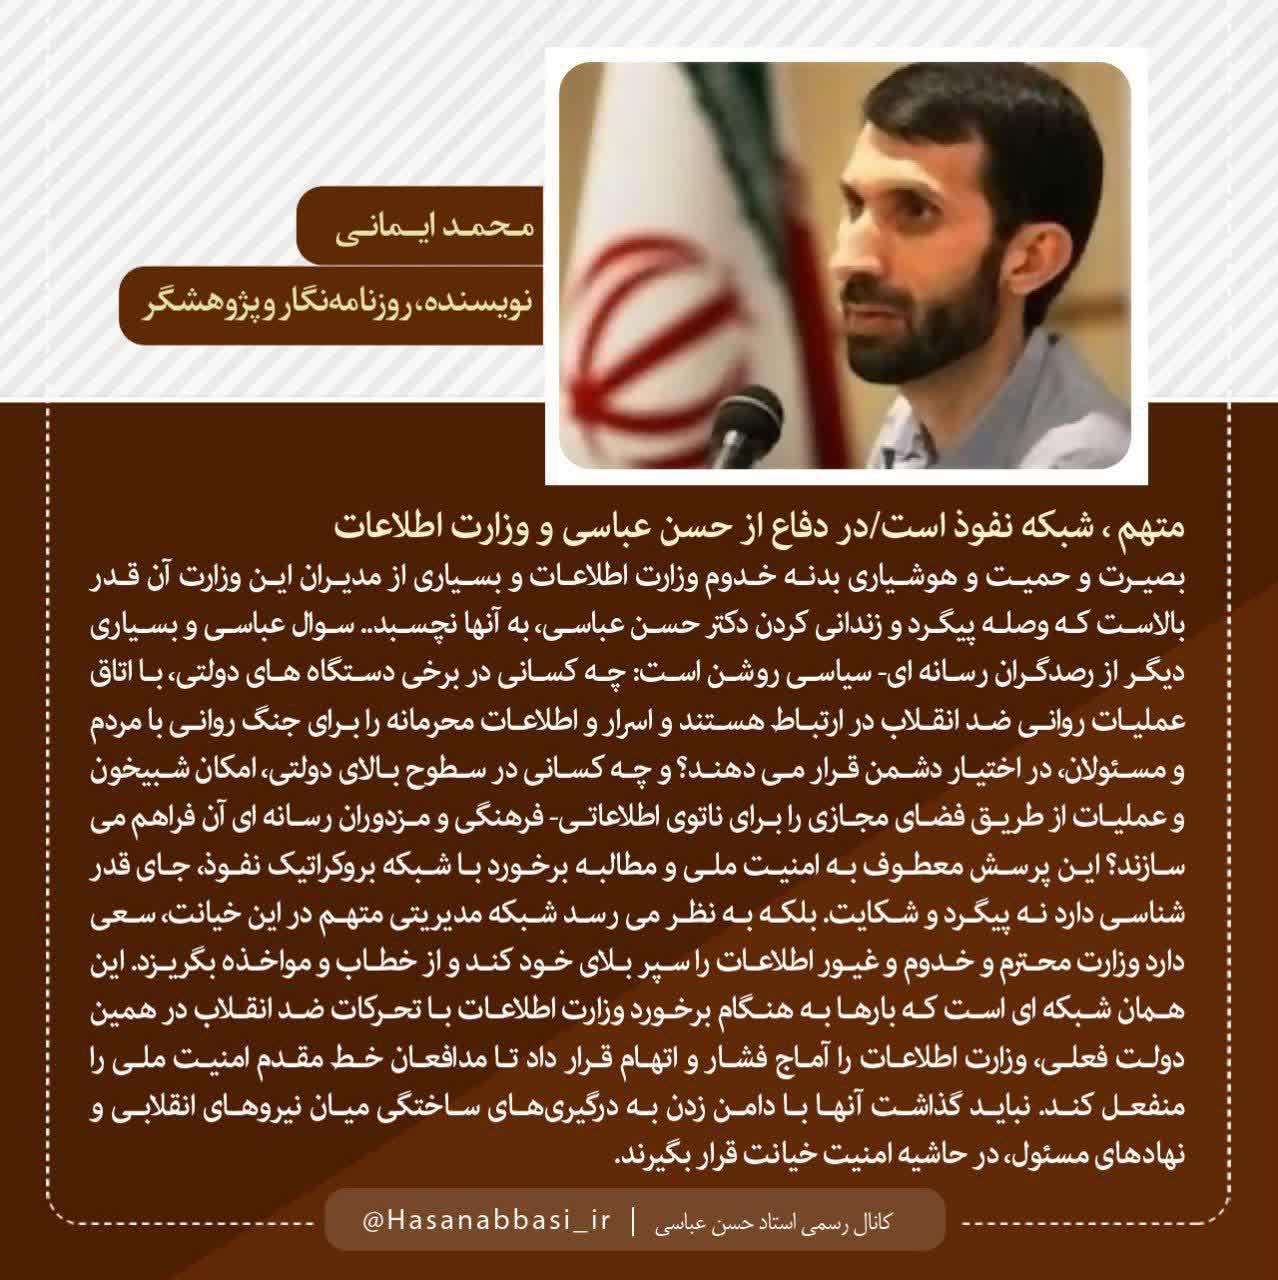 http://dl-abbasi.ir/yekta/1398/Graphic/IMG_V%20(15).jpg